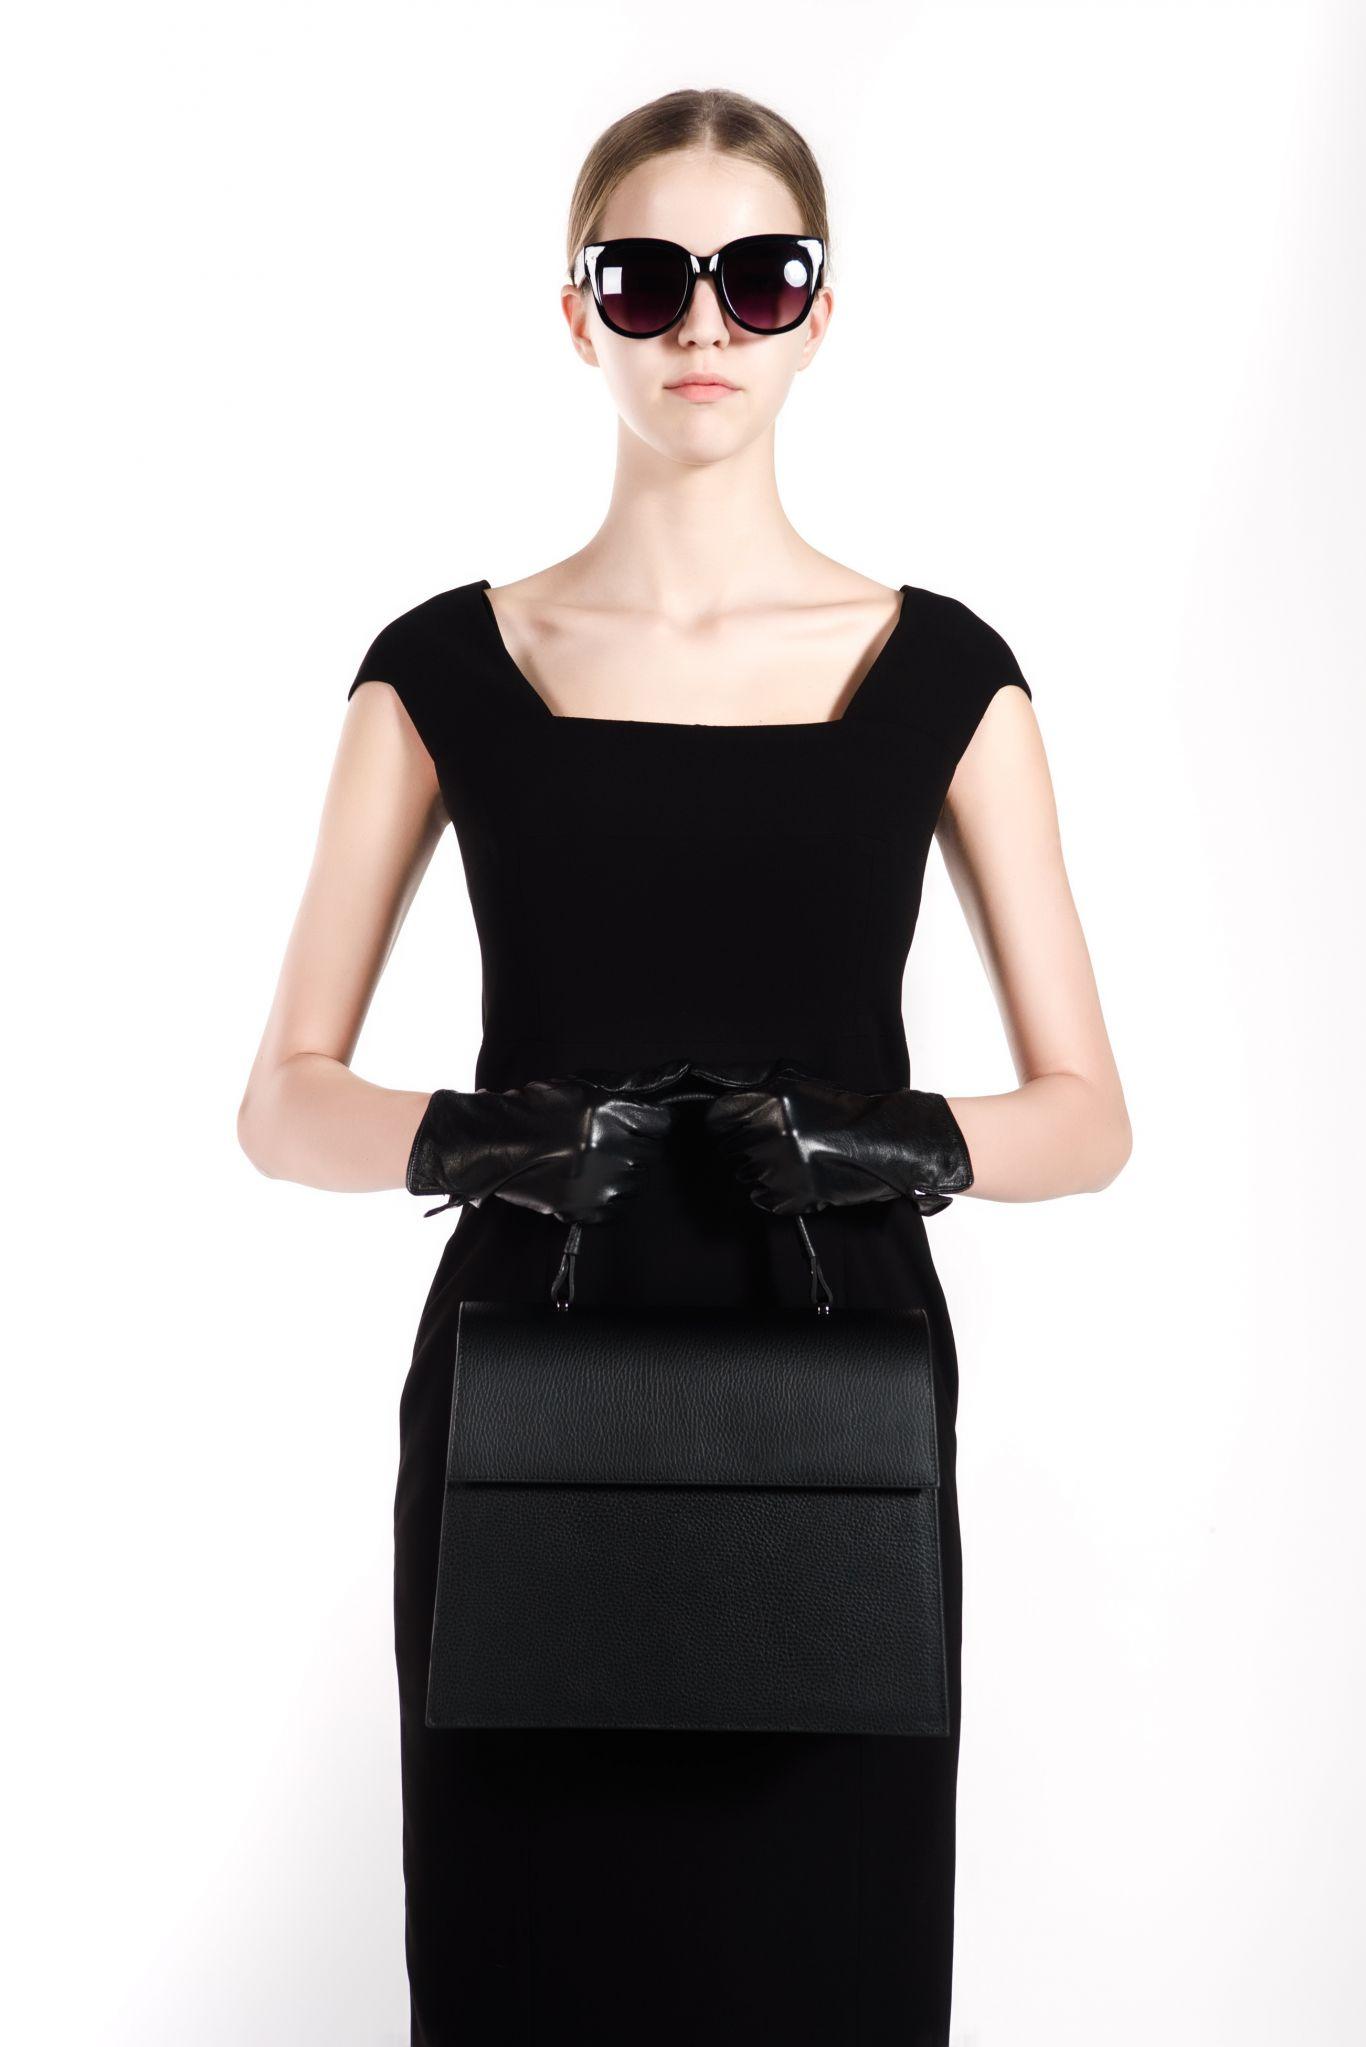 Draganaognjenoviccom Do Fashion